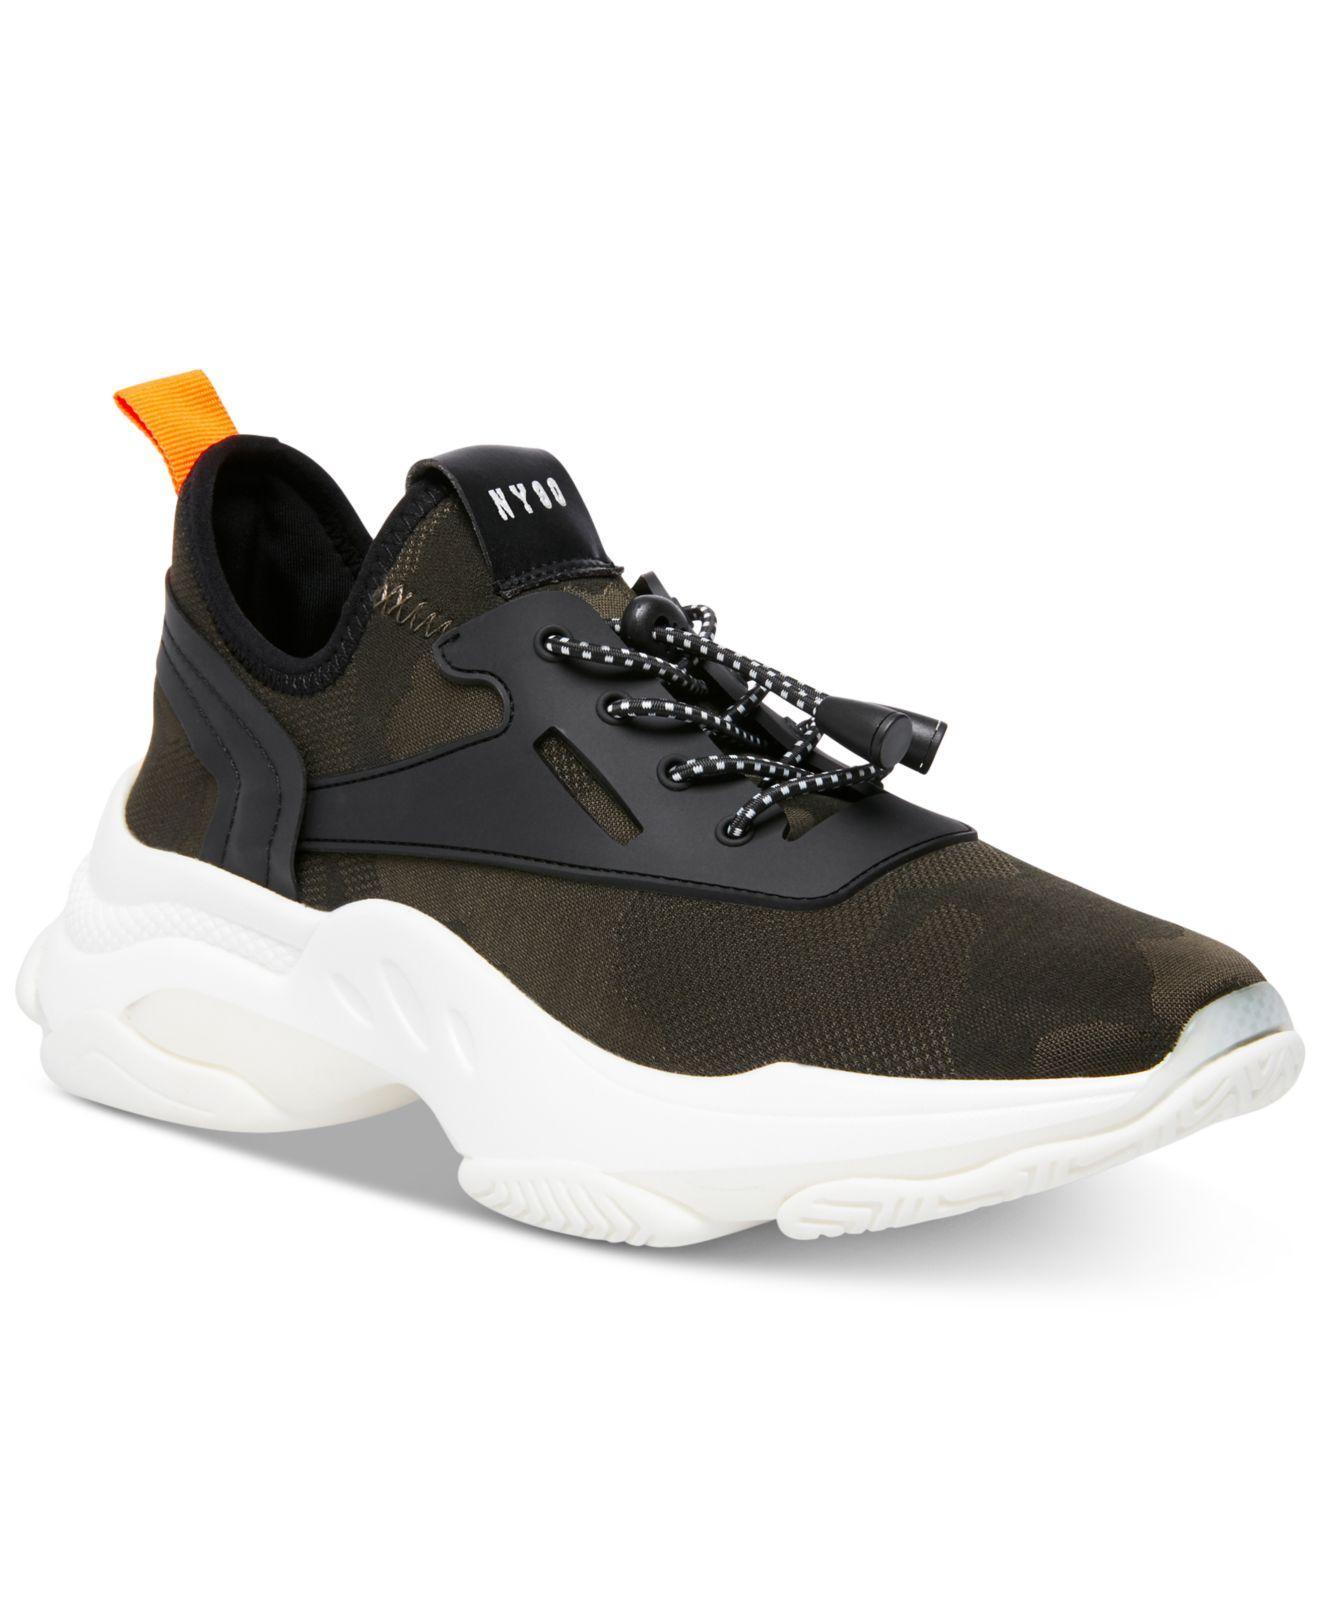 5ceacd63cbb Lyst - Steve Madden Myles Knit Chunky Sneakers